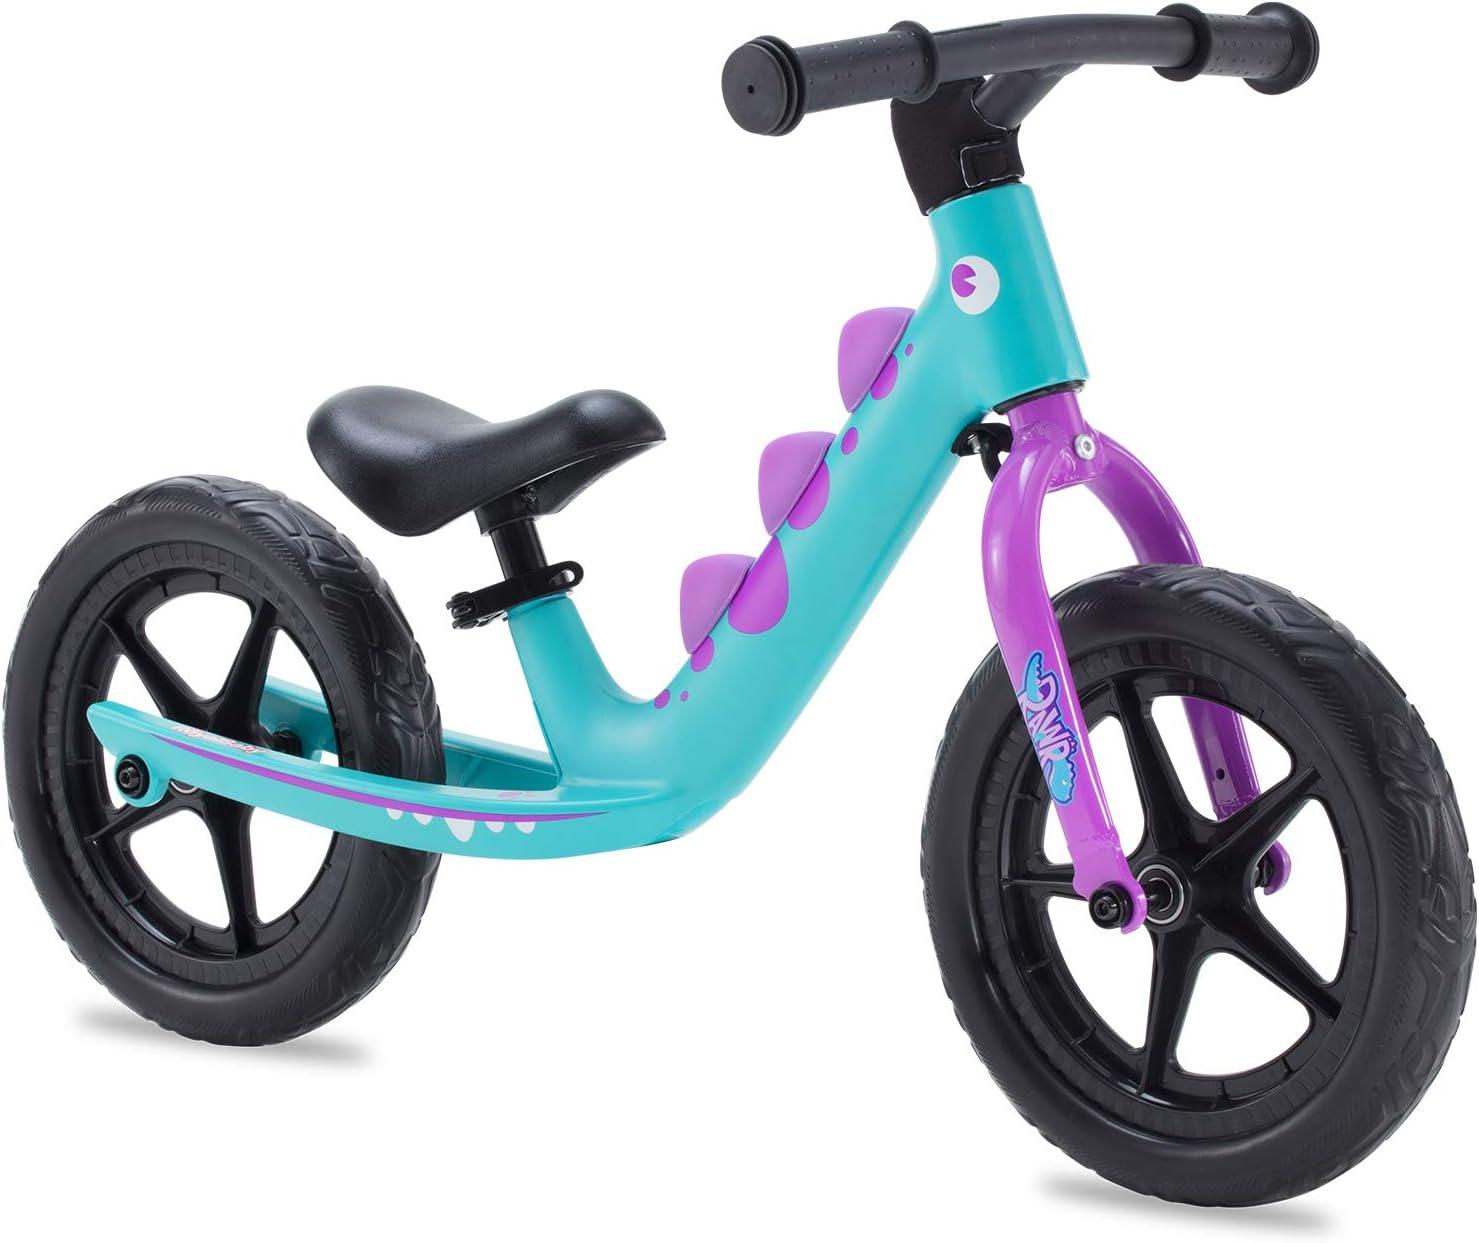 RoyalBaby 全商品オープニング価格 Kid's Balance Bike Dinosaur Toddler 超激安 Tr Beginner Sport